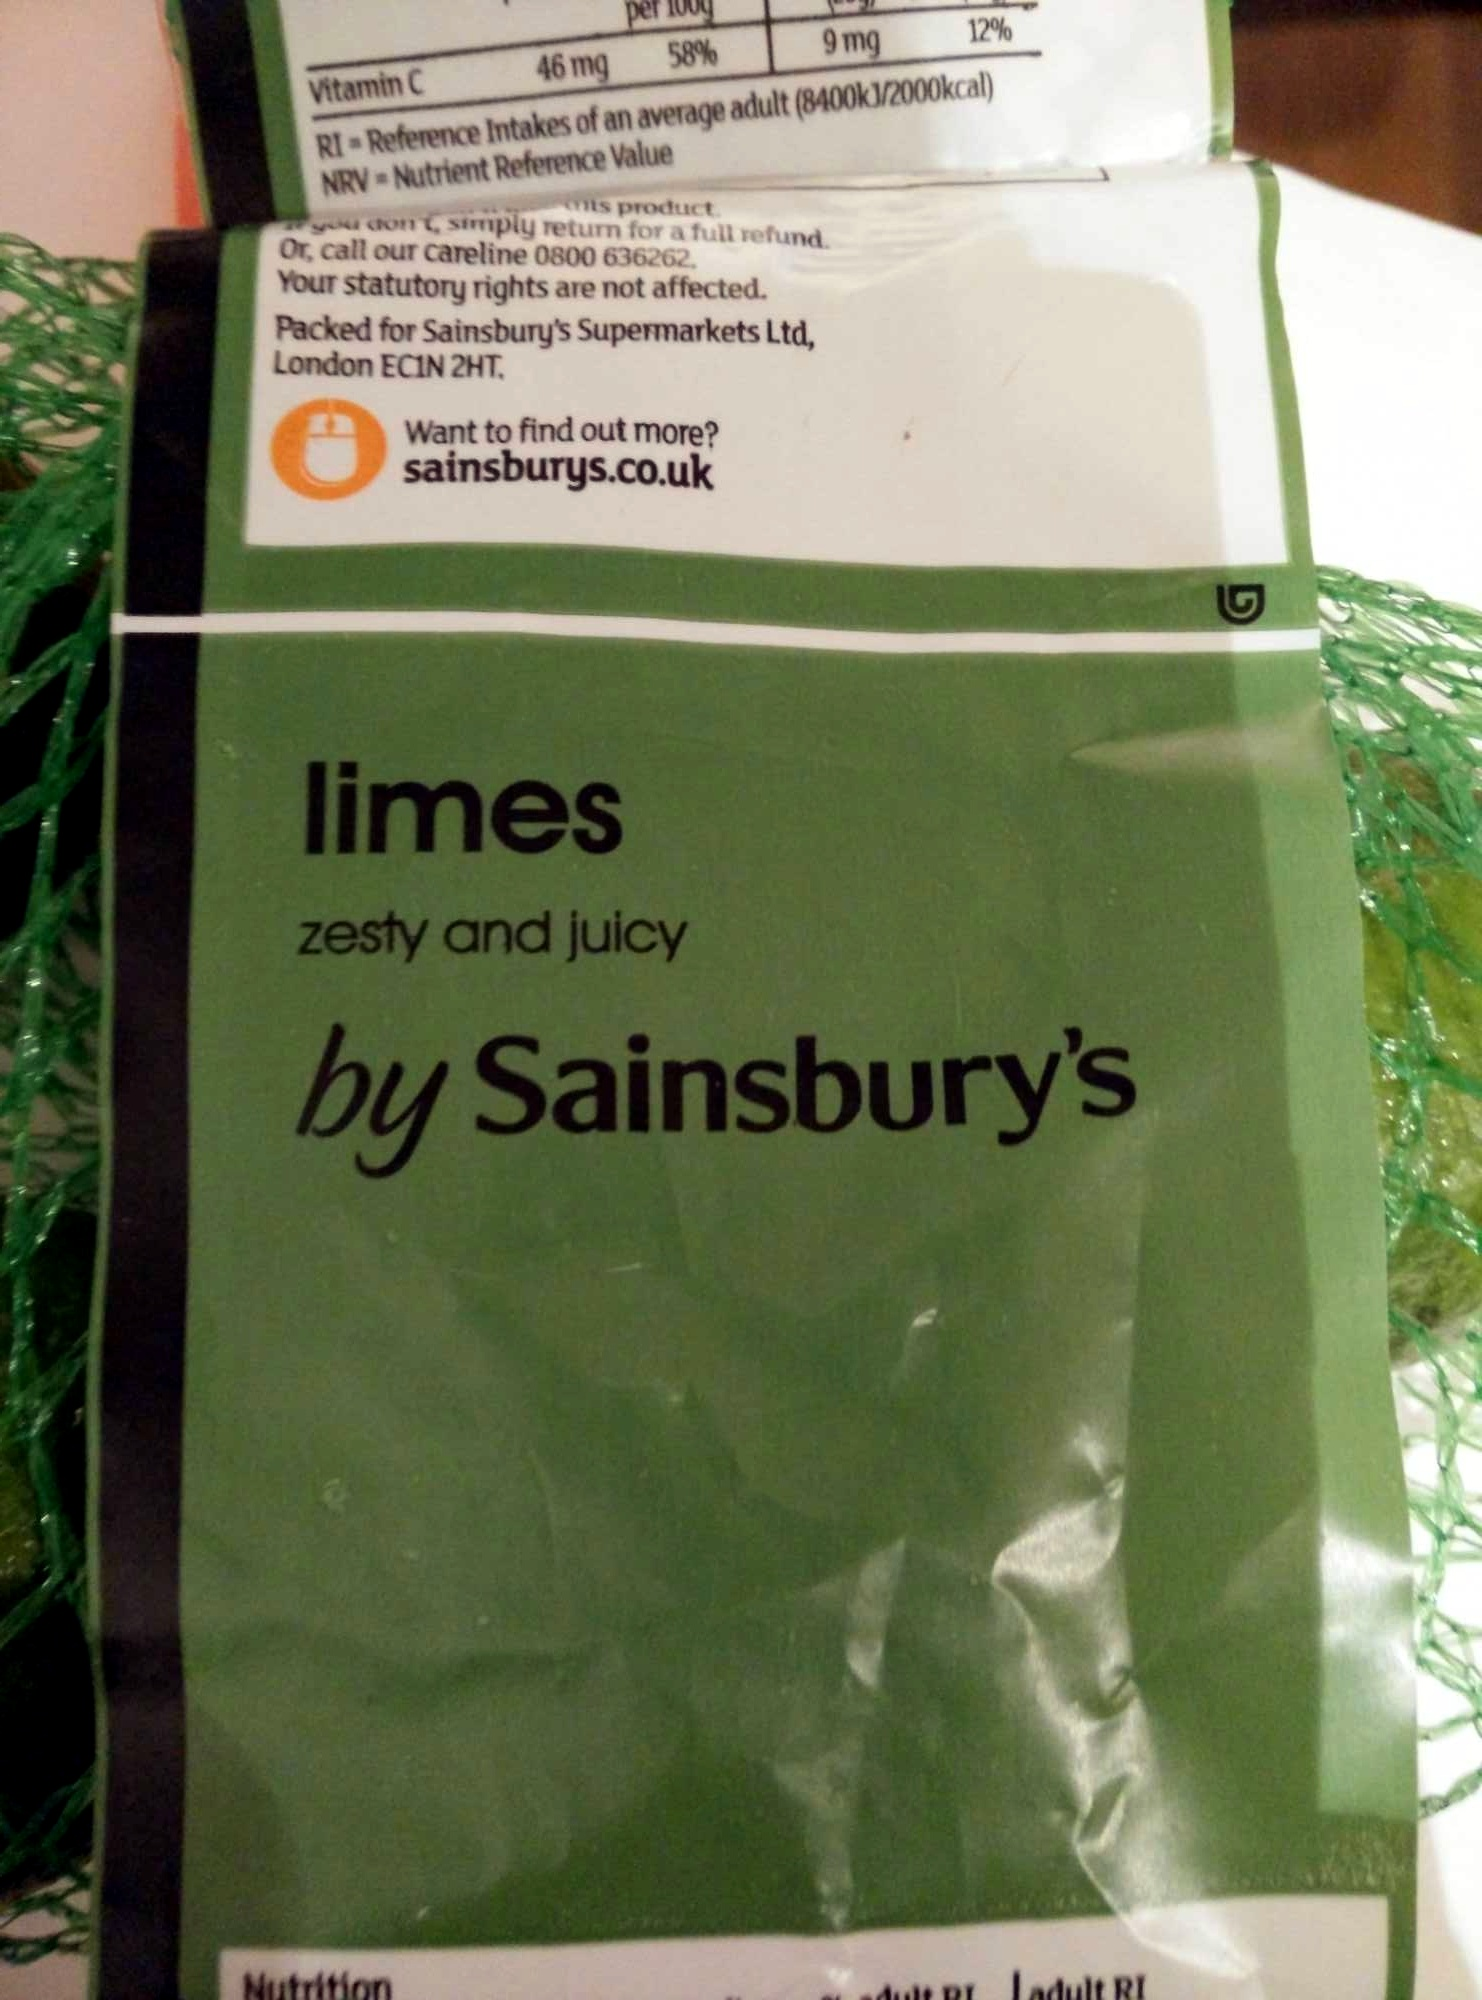 limes - Product - en